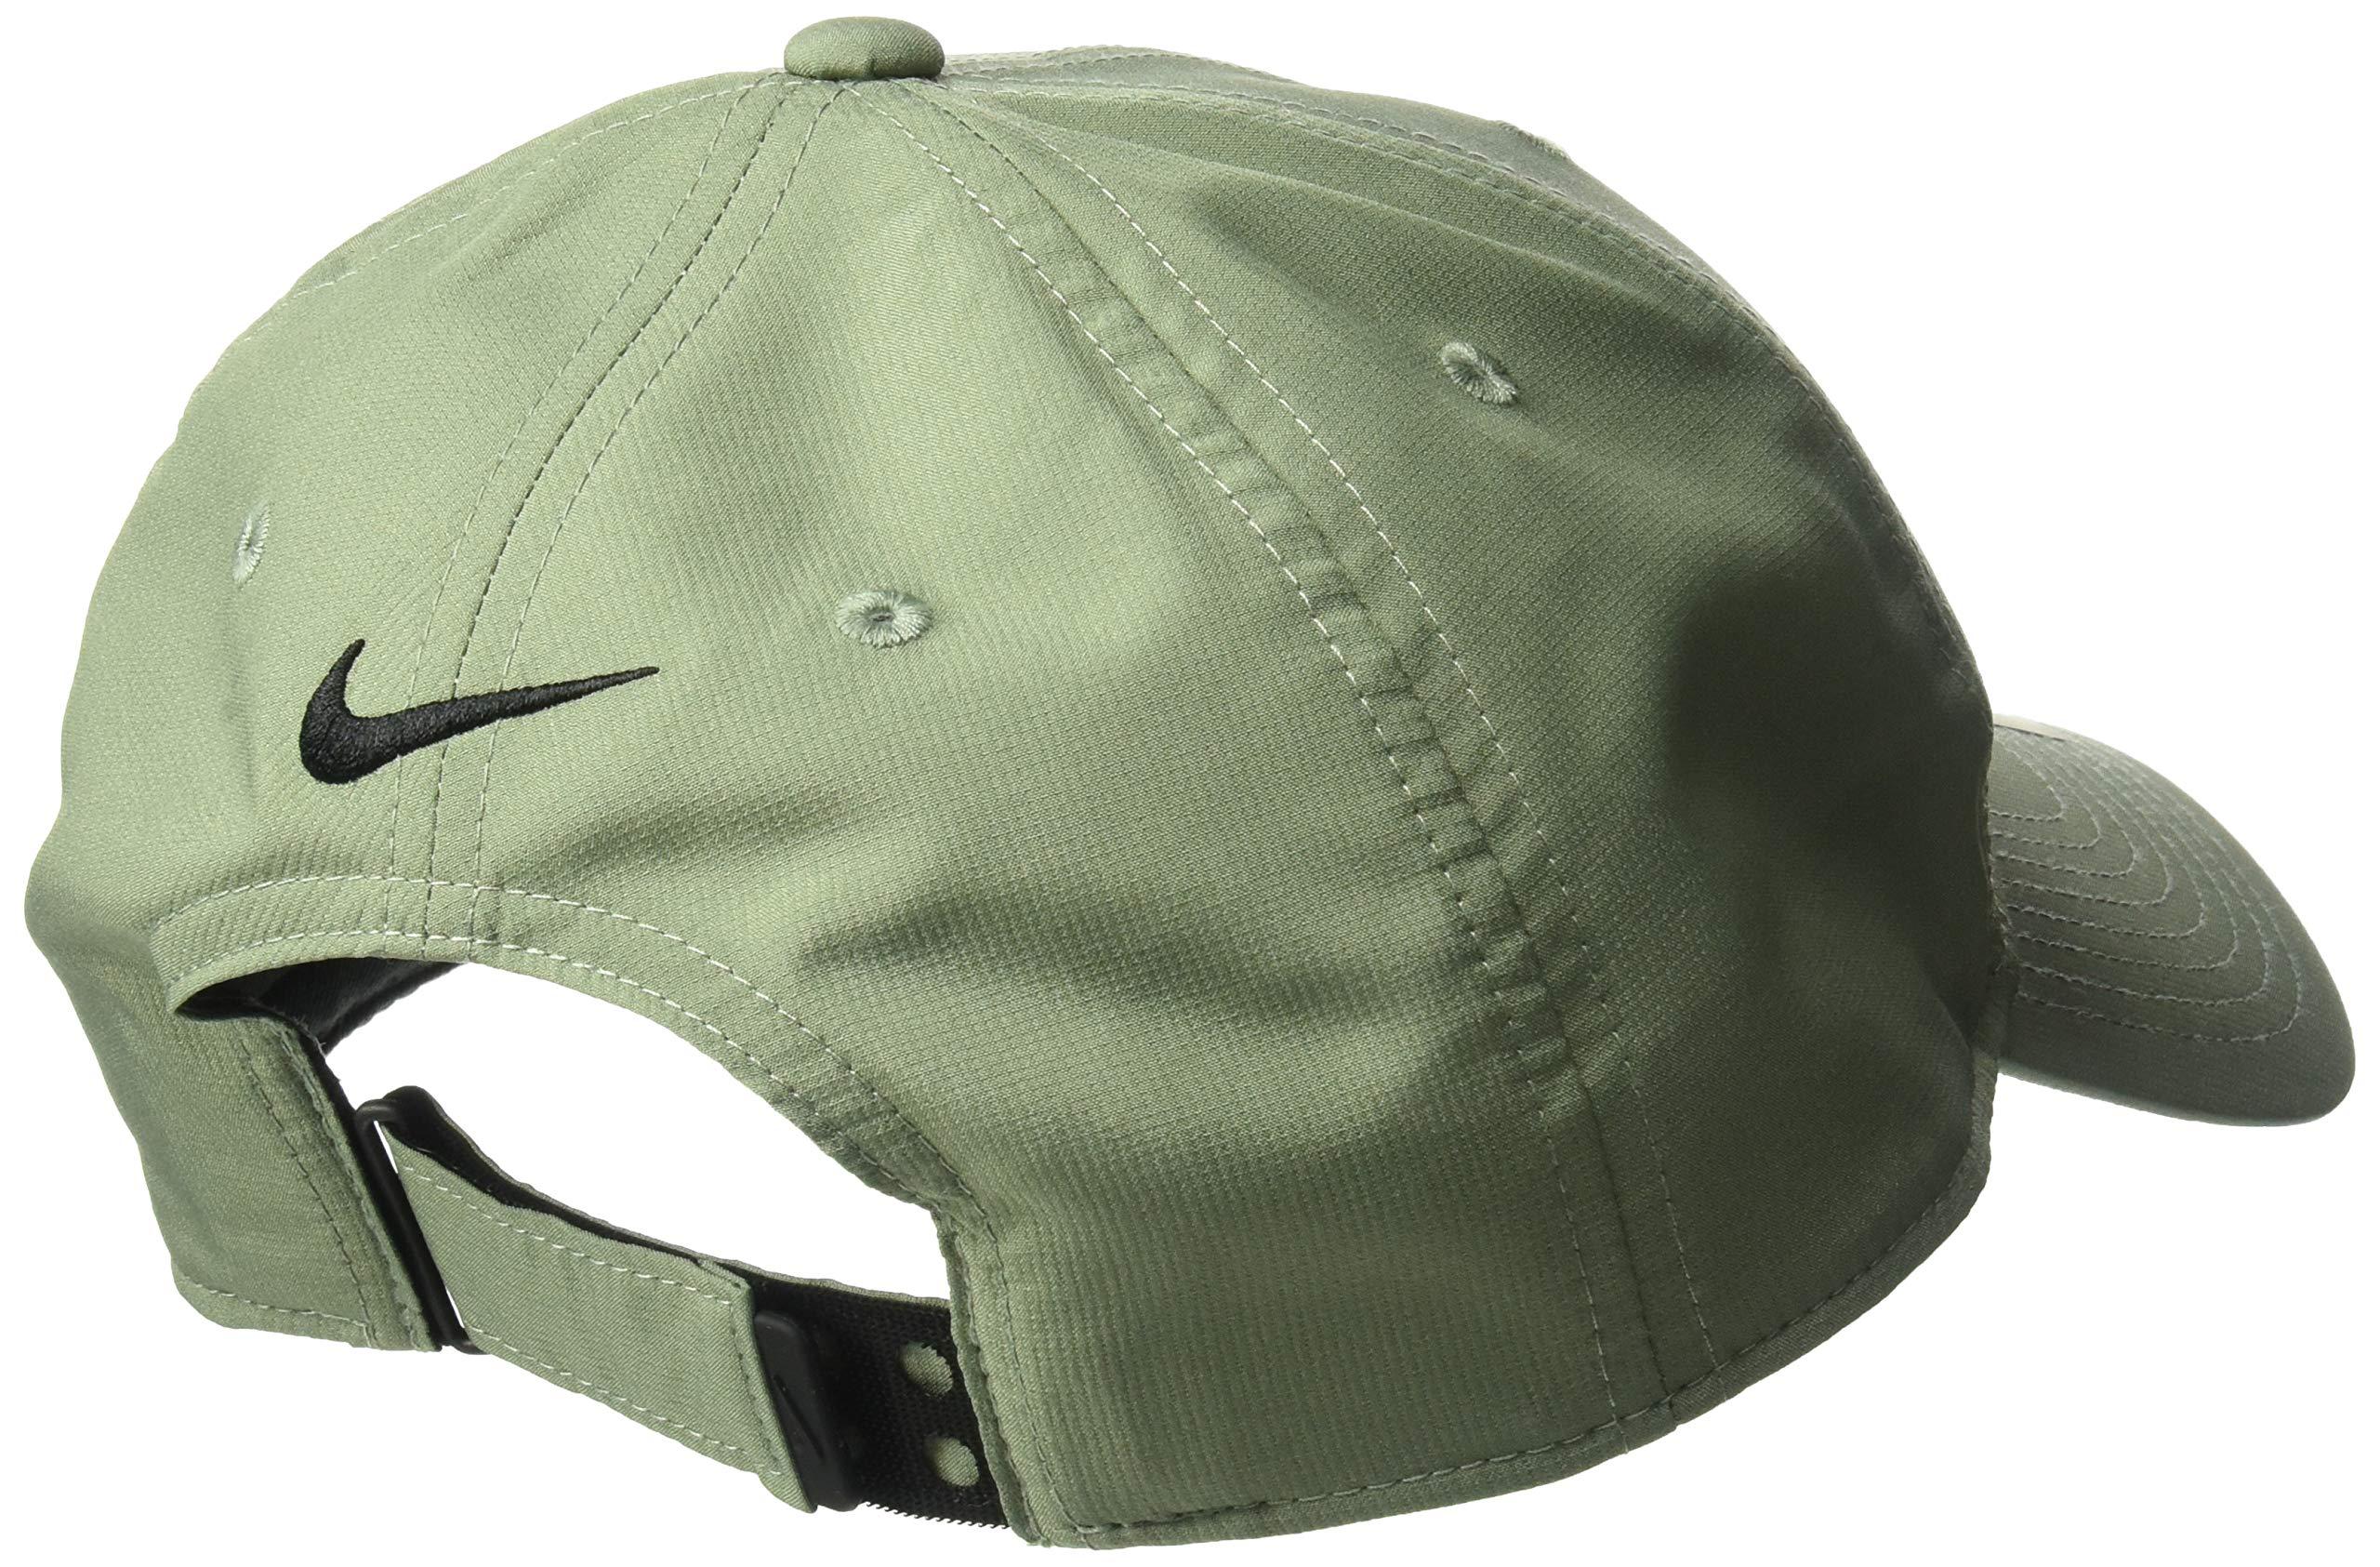 ec61f4e5a Nike Unisex Legacy Golf Cap, Adjustable & Lightweight Hat for Men and  Women, Vintage Lichen/Anthracite/Black